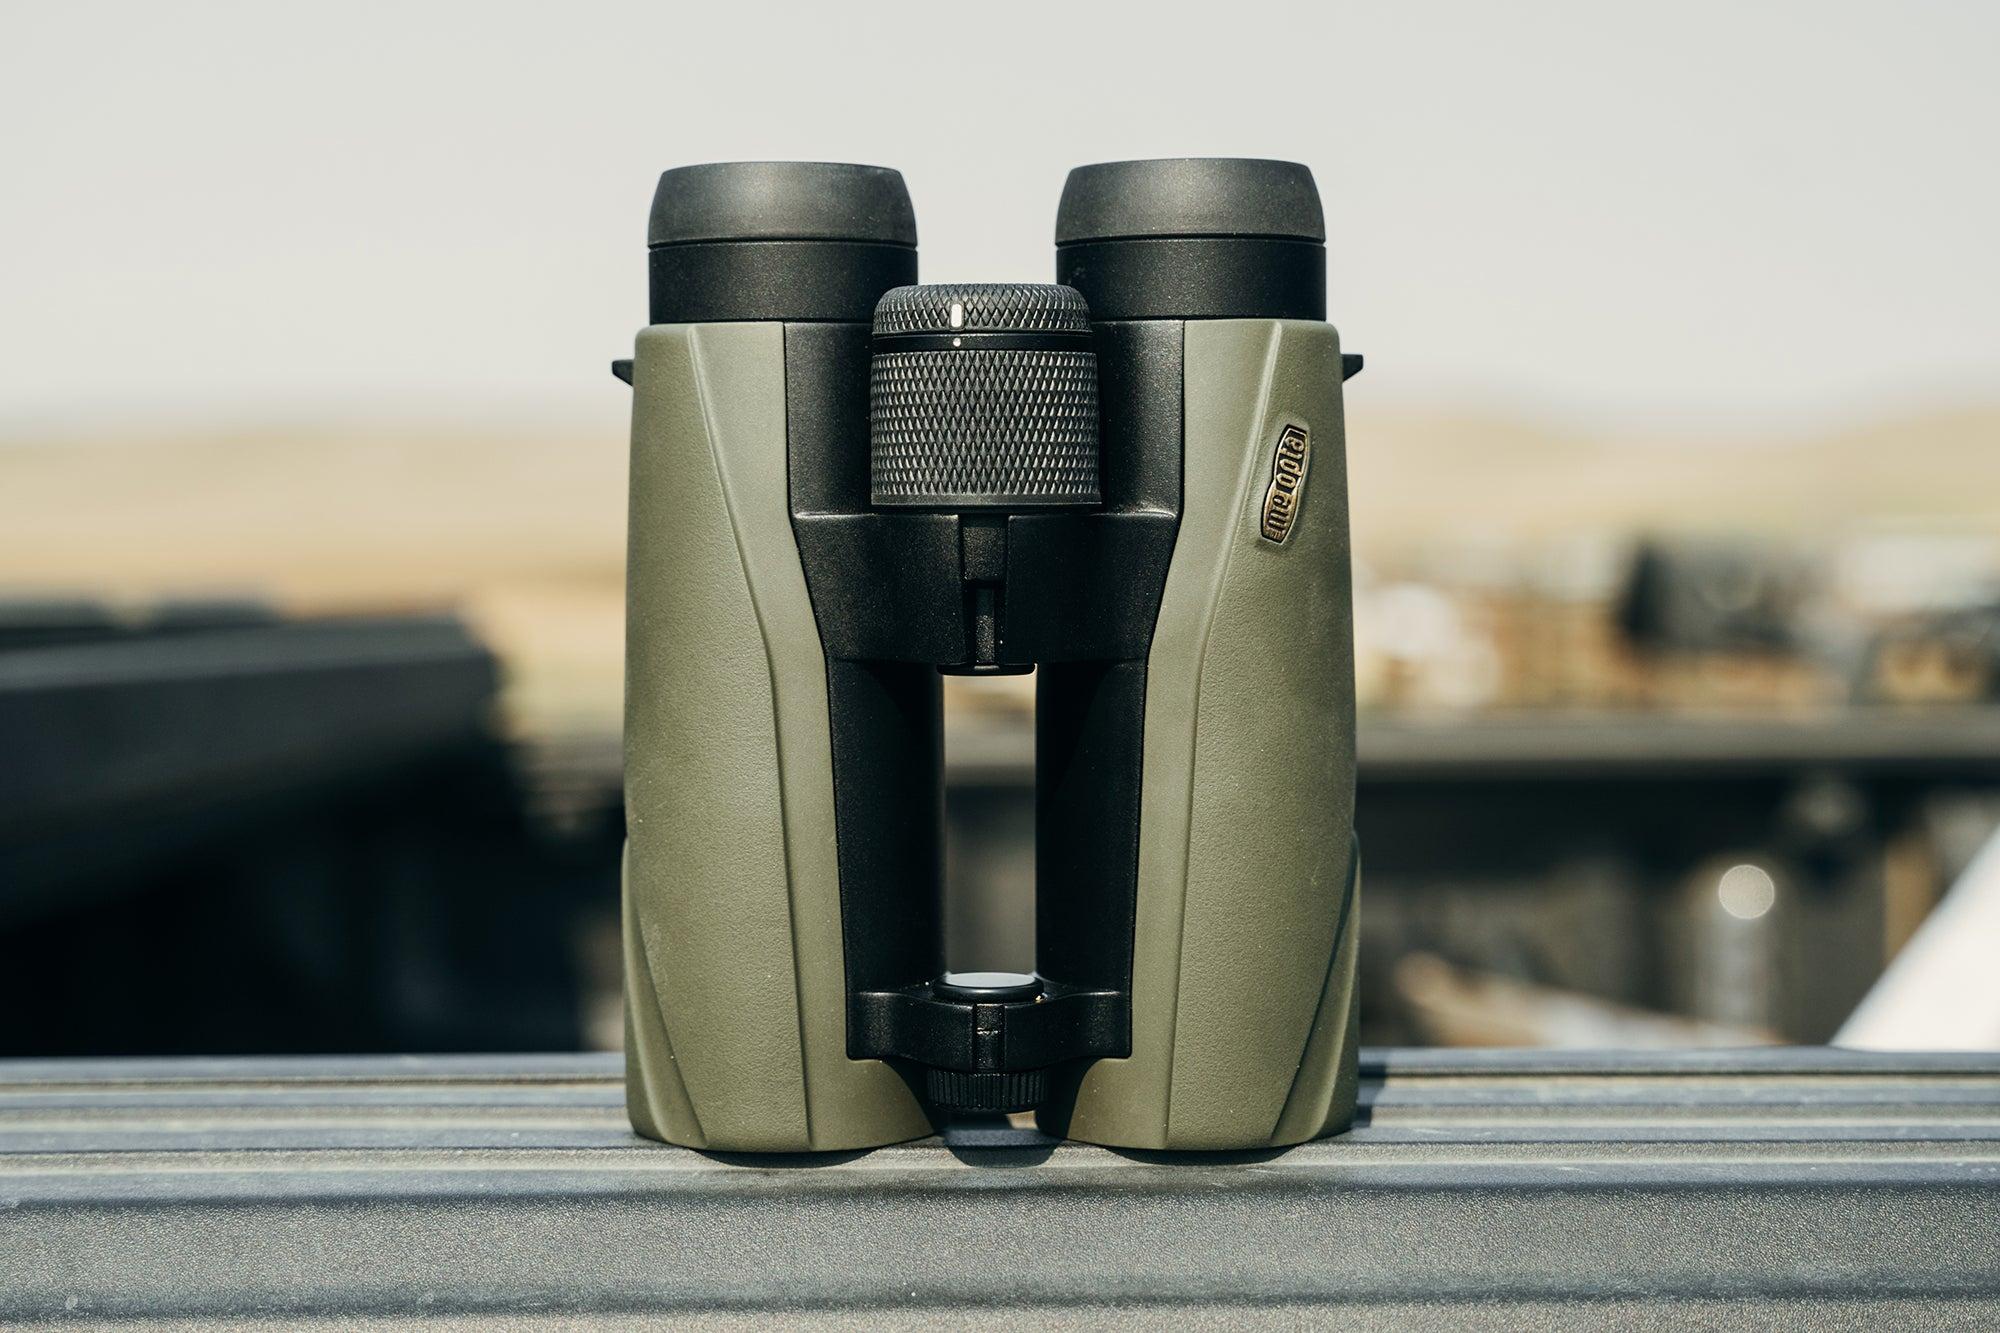 meopta binocular